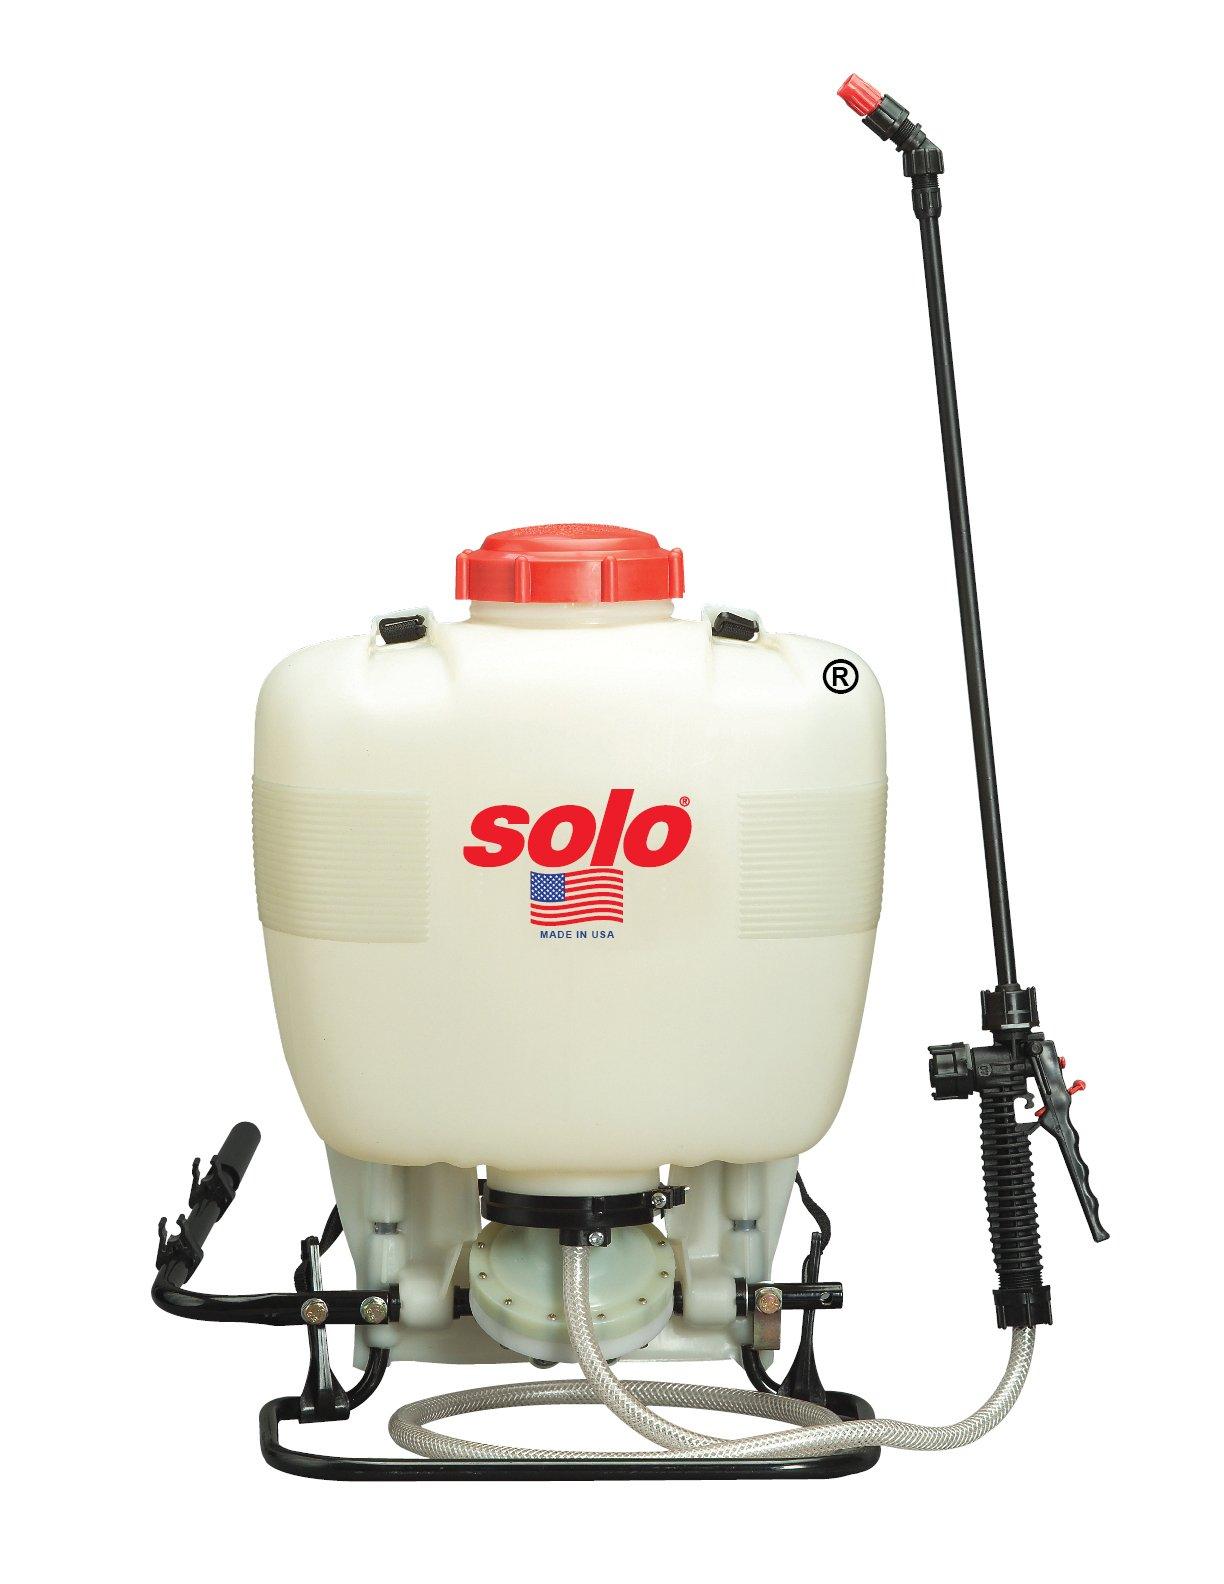 Solo 475-B Professional Diaphragm Pump Backpack Sprayer, 4-Gallon